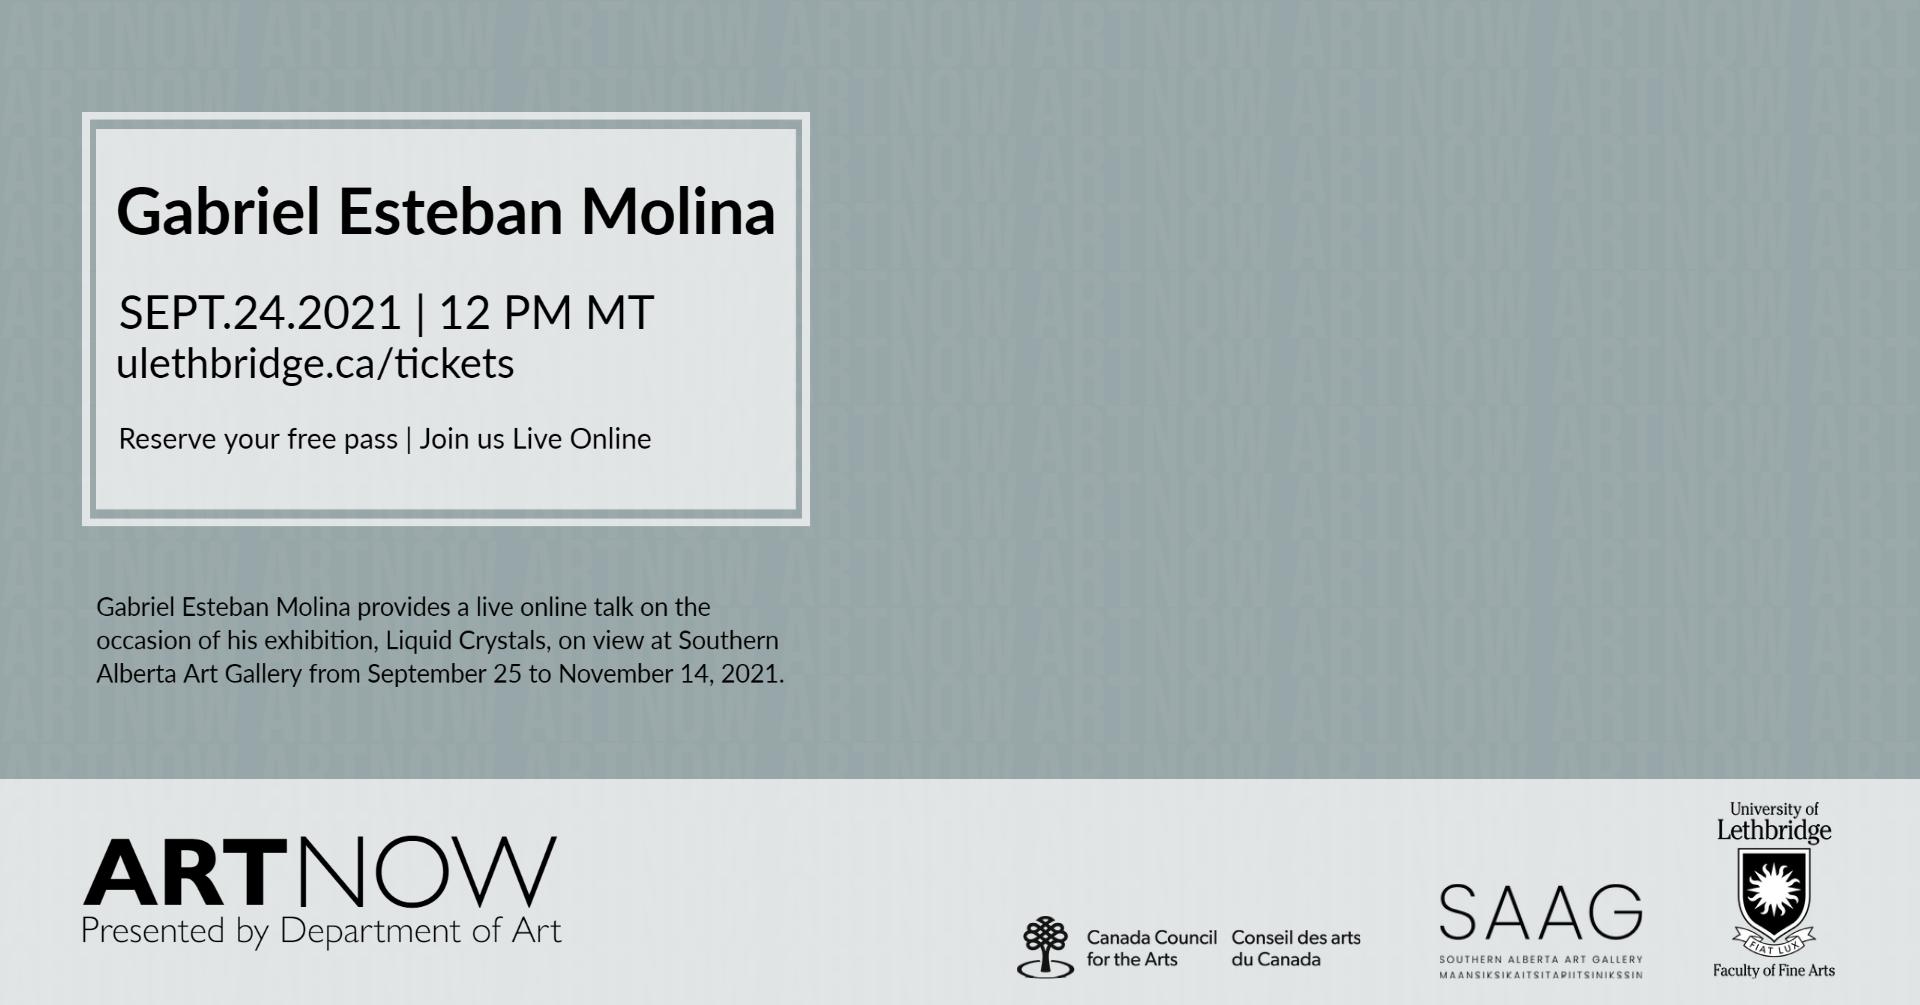 Gabriel Esteban Molina speaks in the Art NOW series - online talk